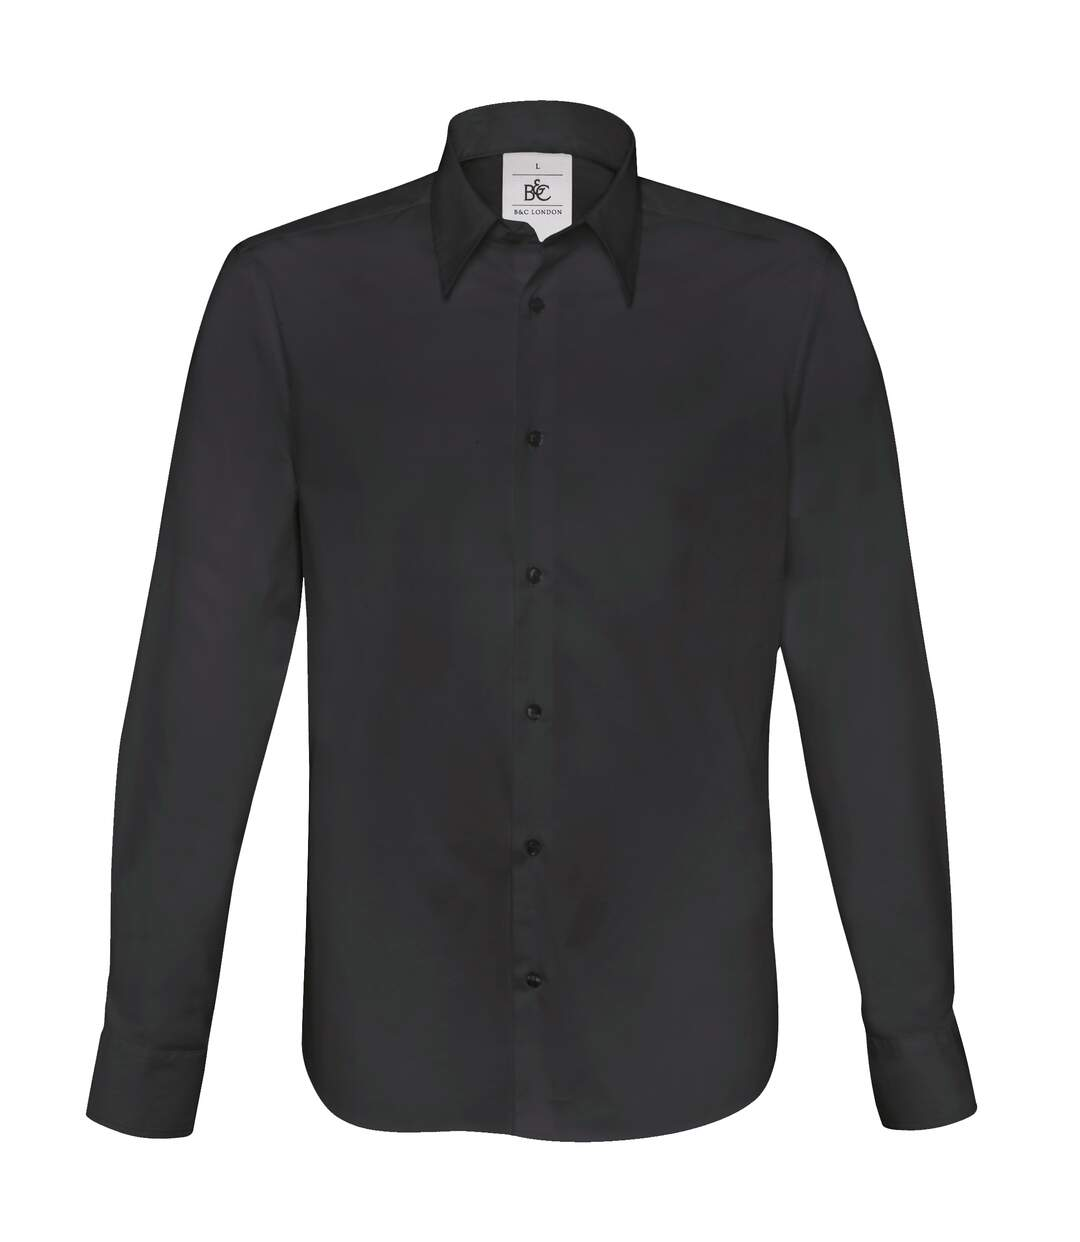 B&C Mens London Long Sleeve Poplin Shirt (Black) - UTRW3040